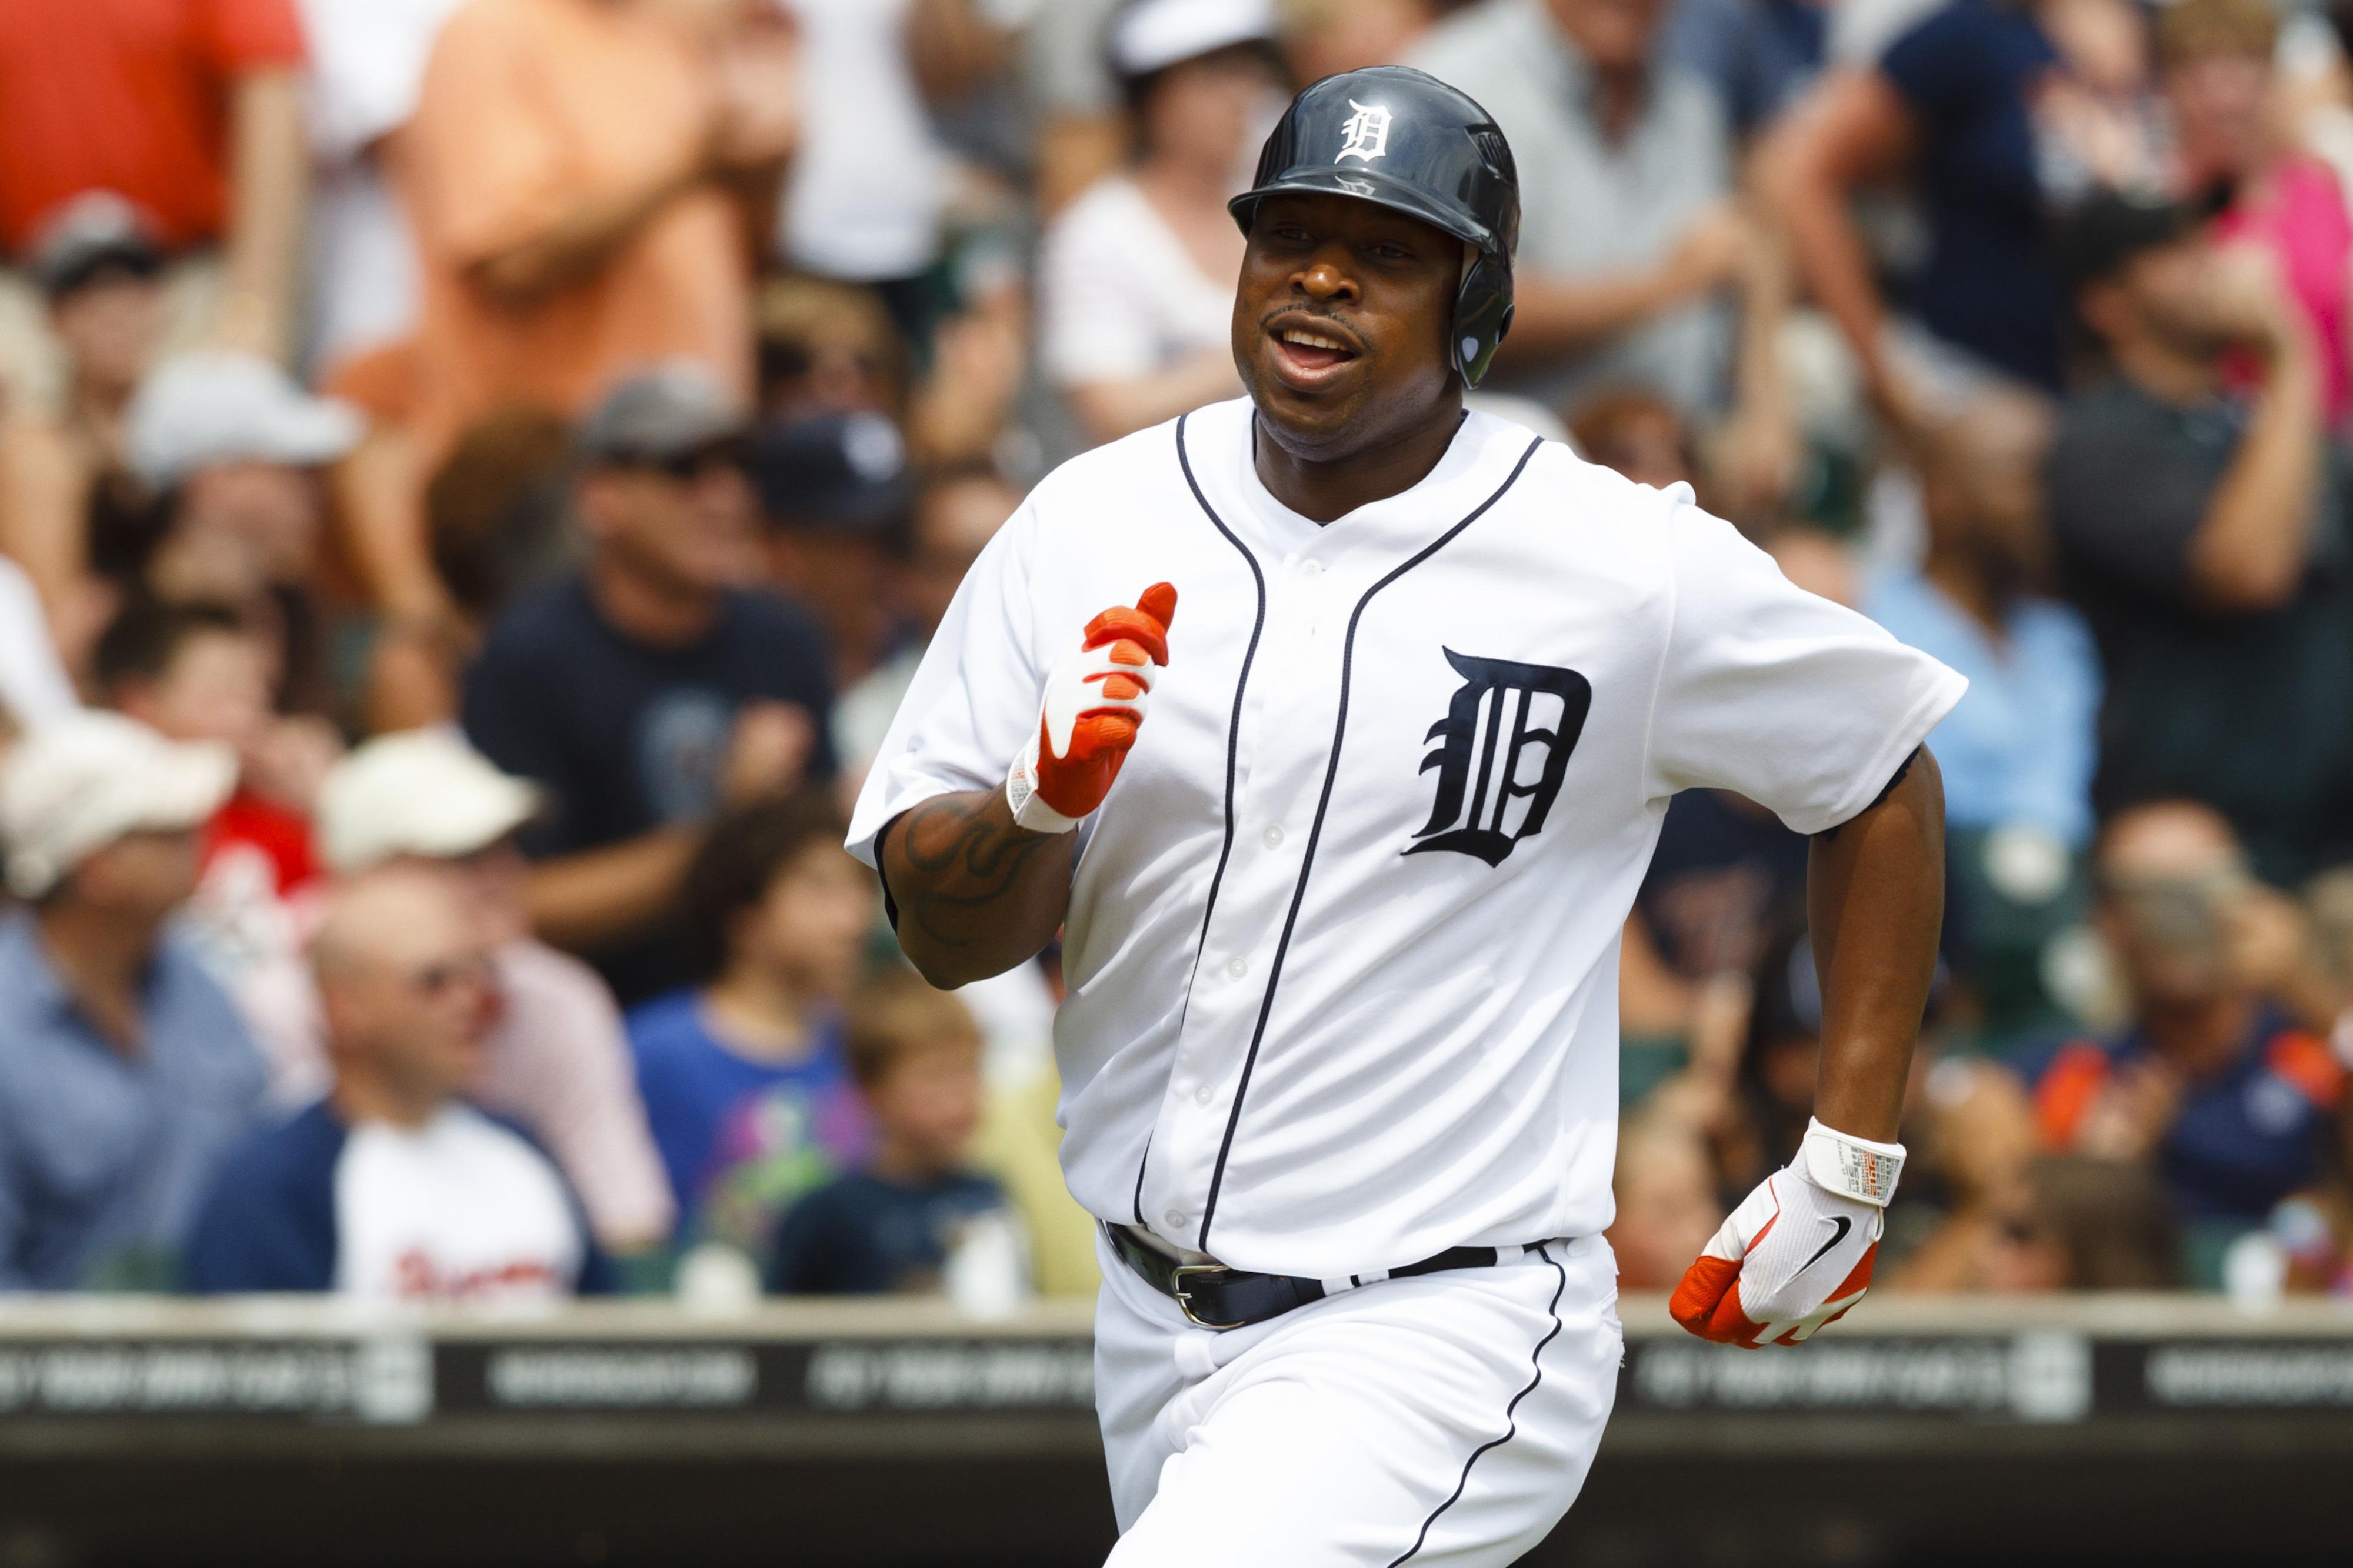 July 8, 2012; Detroit, MI, USA; Detroit Tigers designated hitter Delmon Young (21) scores a run against the Kansas City Royals at Comerica Park. Mandatory Credit: Rick Osentoski-US PRESSWIRE